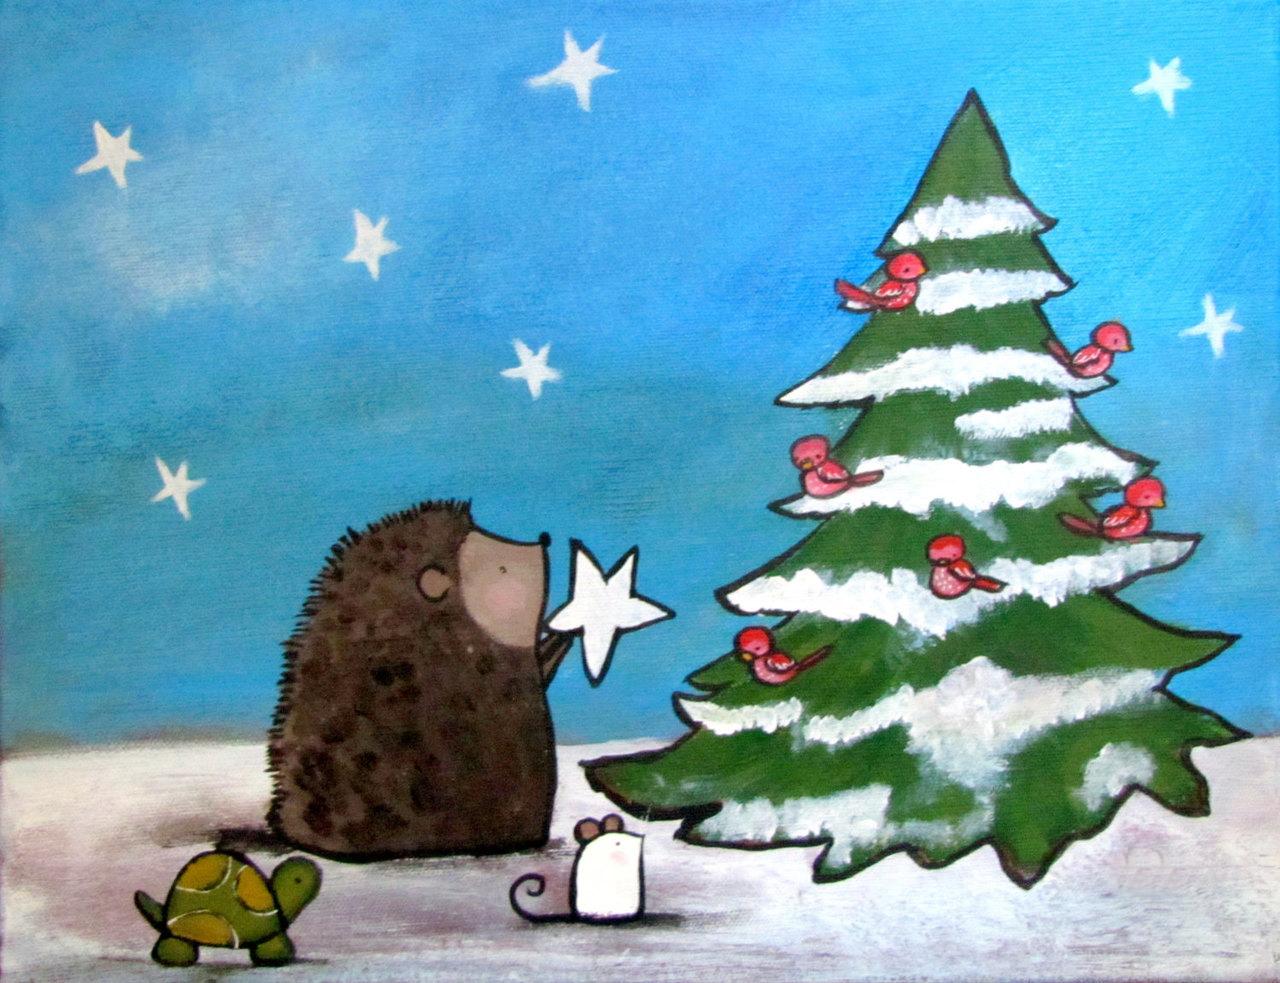 hedgehog animals decorate christmas tree composition